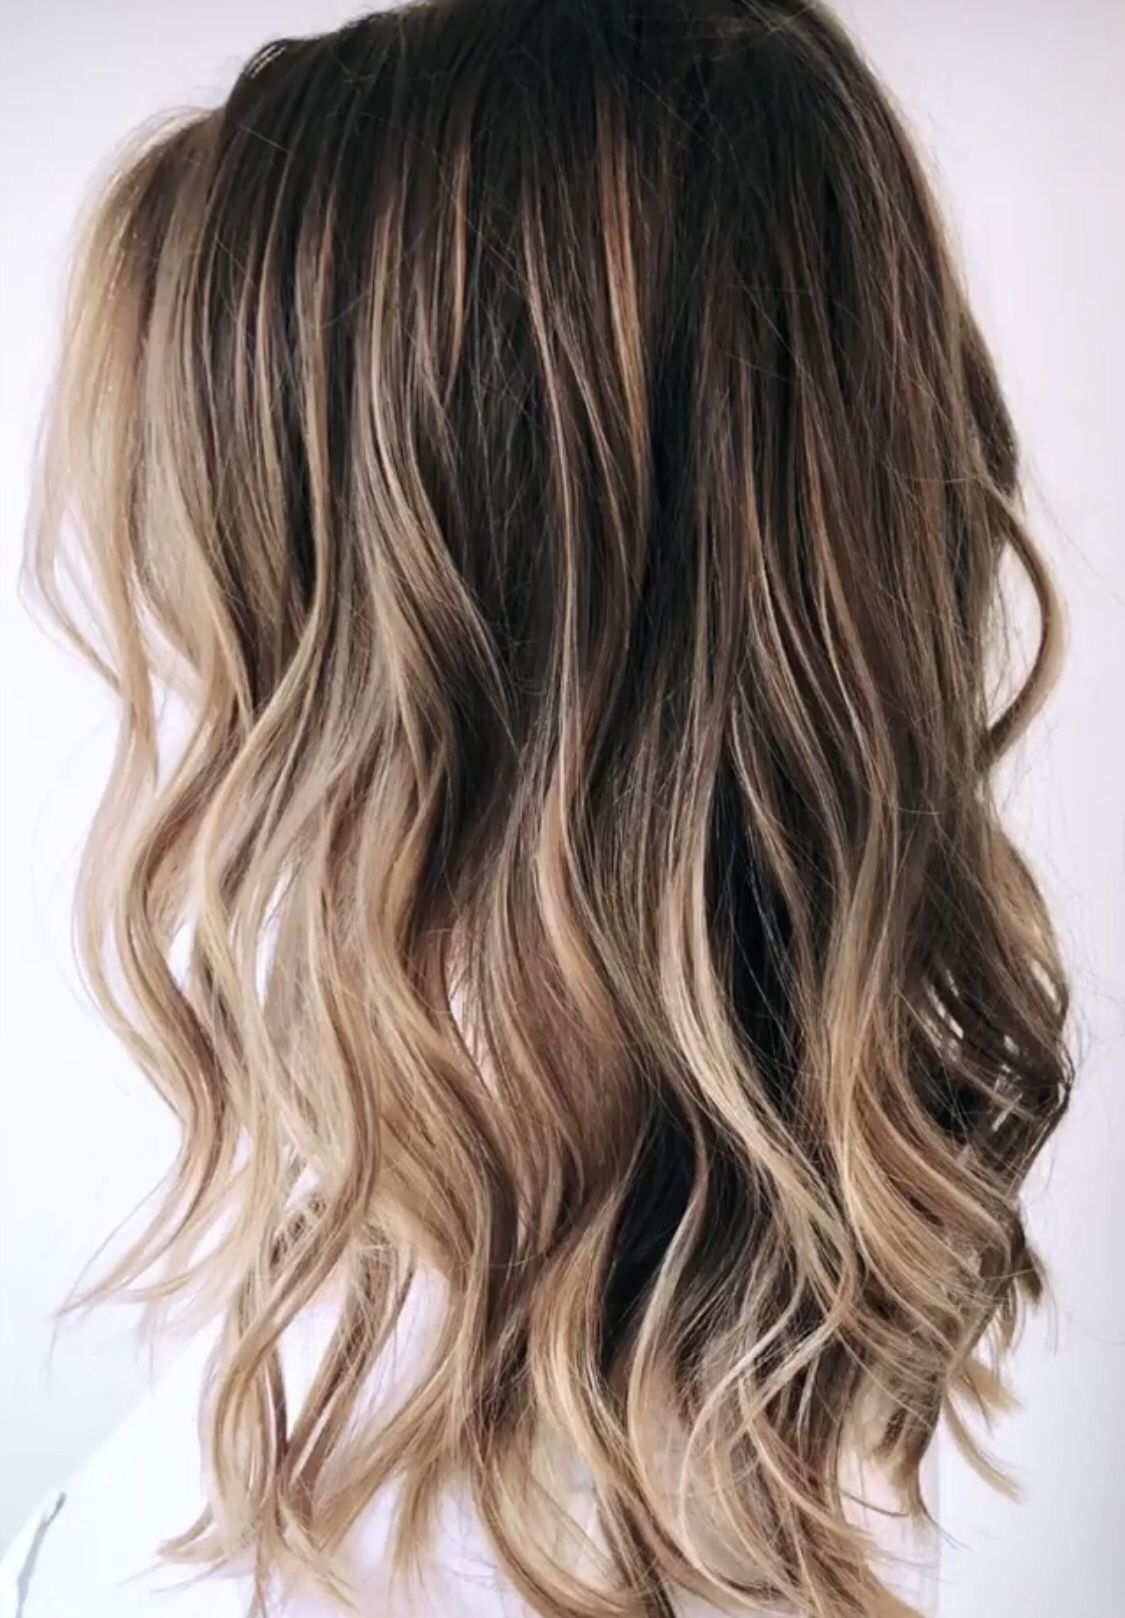 Balayage and beach waves on a medium length haircut for